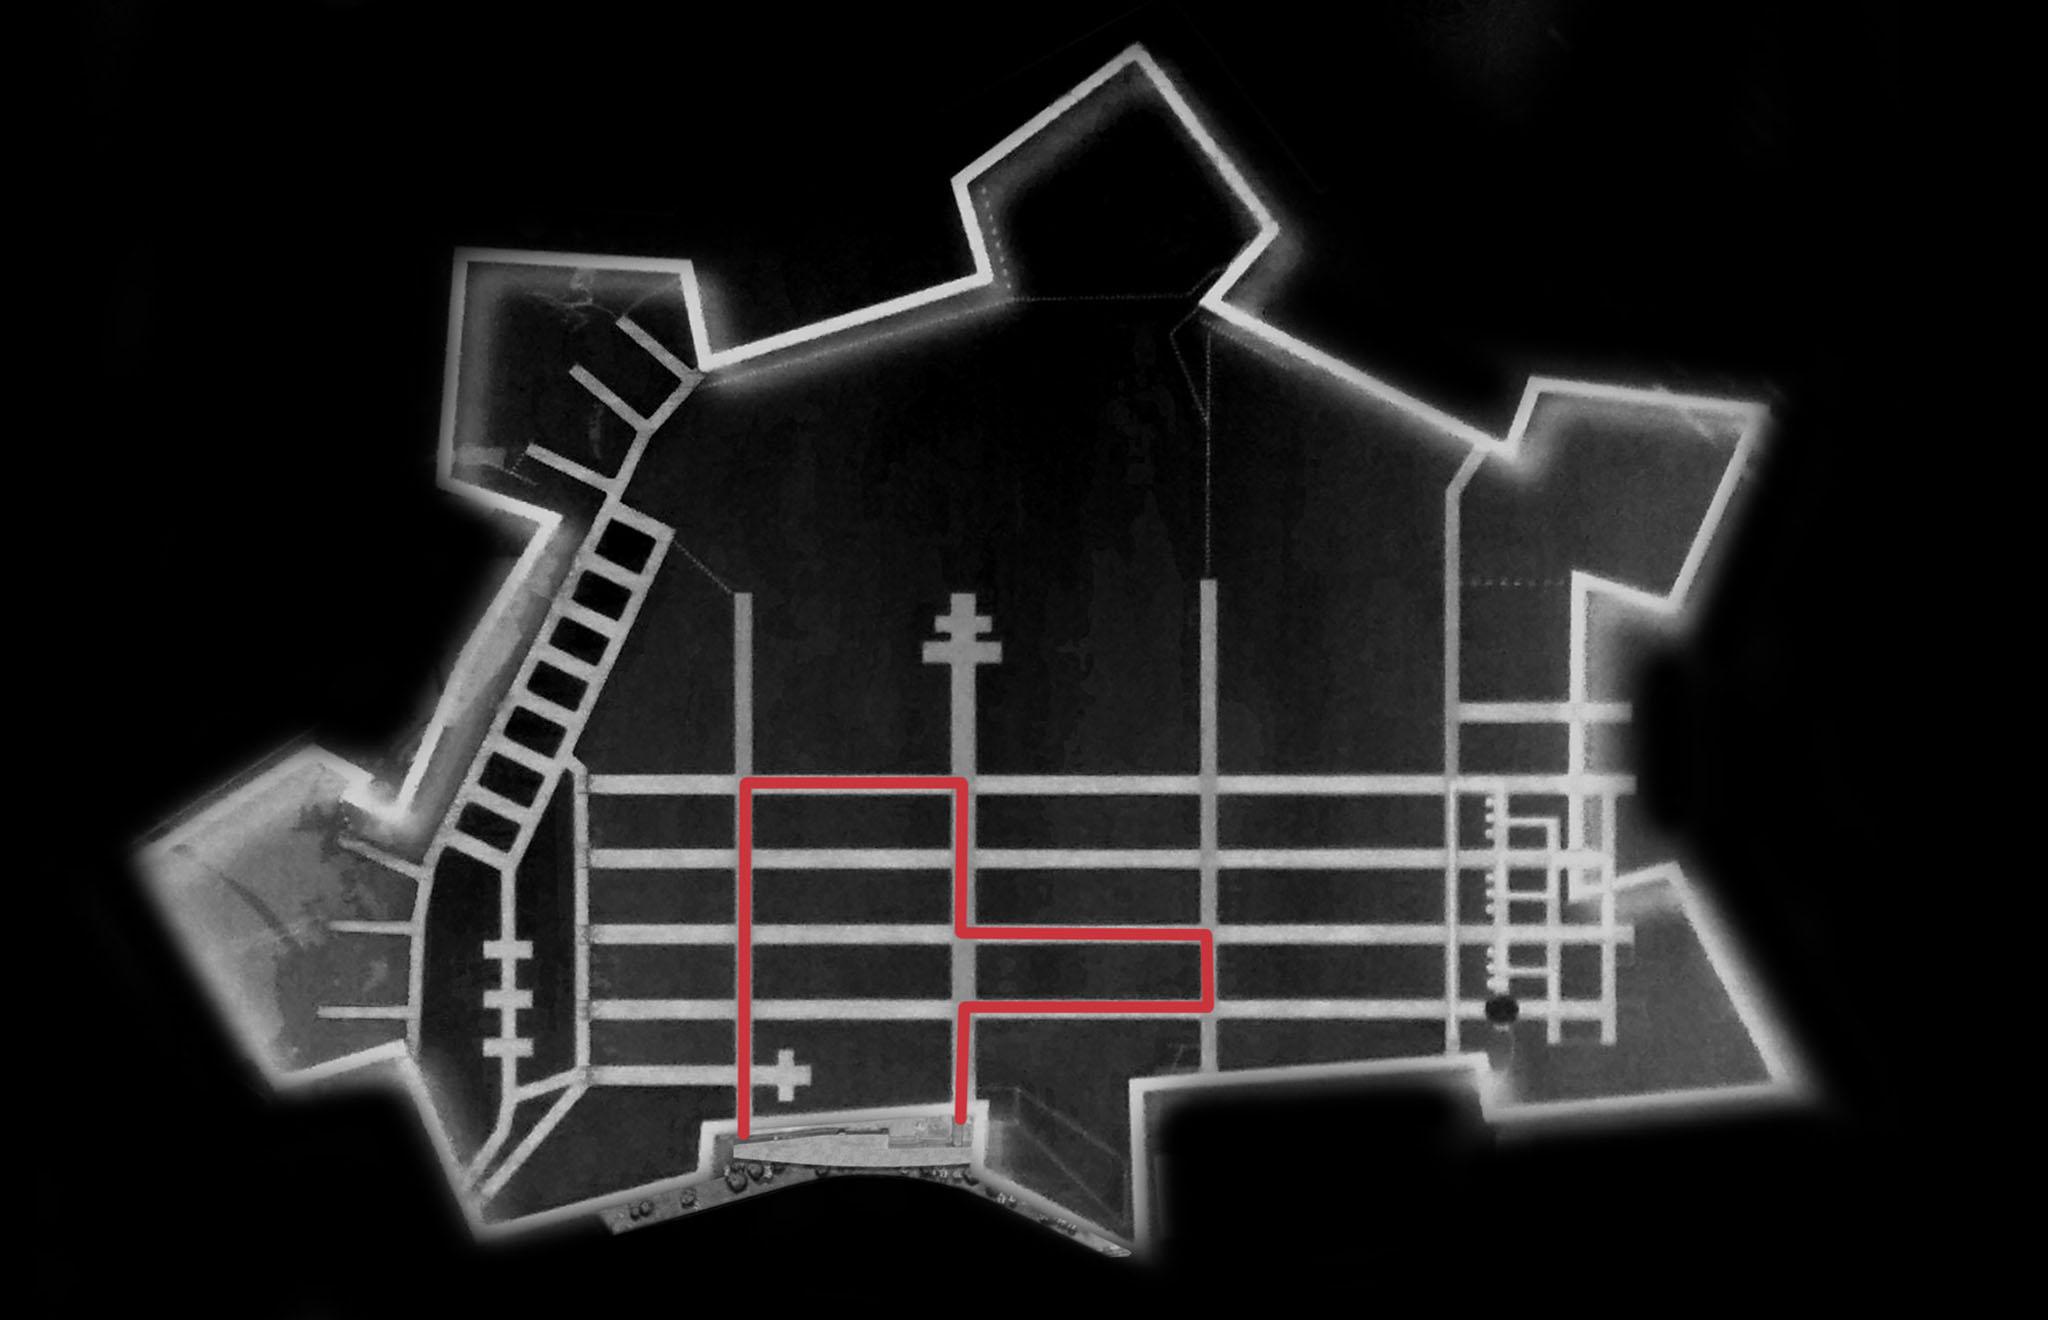 maskarade-scenographie-verdun-citadelle-basse-grand-guerre-monument-plan